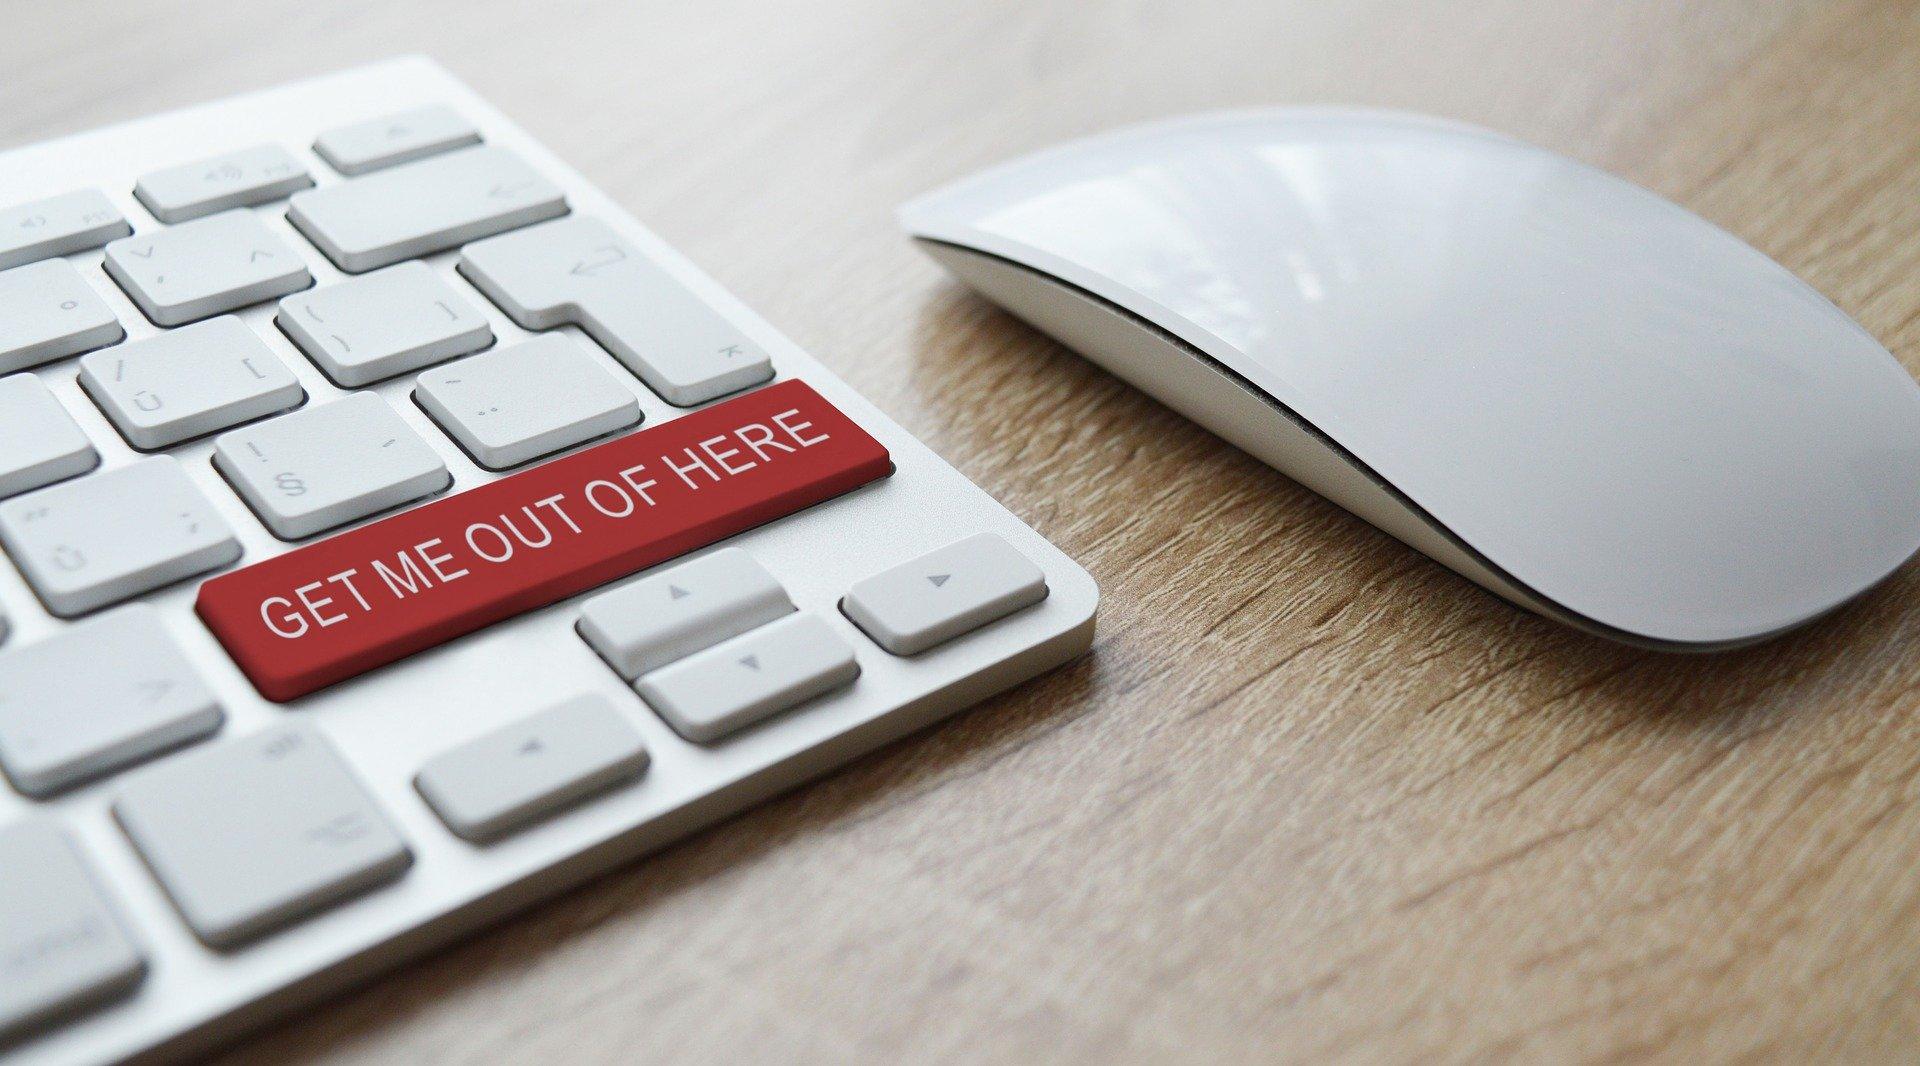 PS5 Beta Testing Scam  Beware of Fake Advertisements